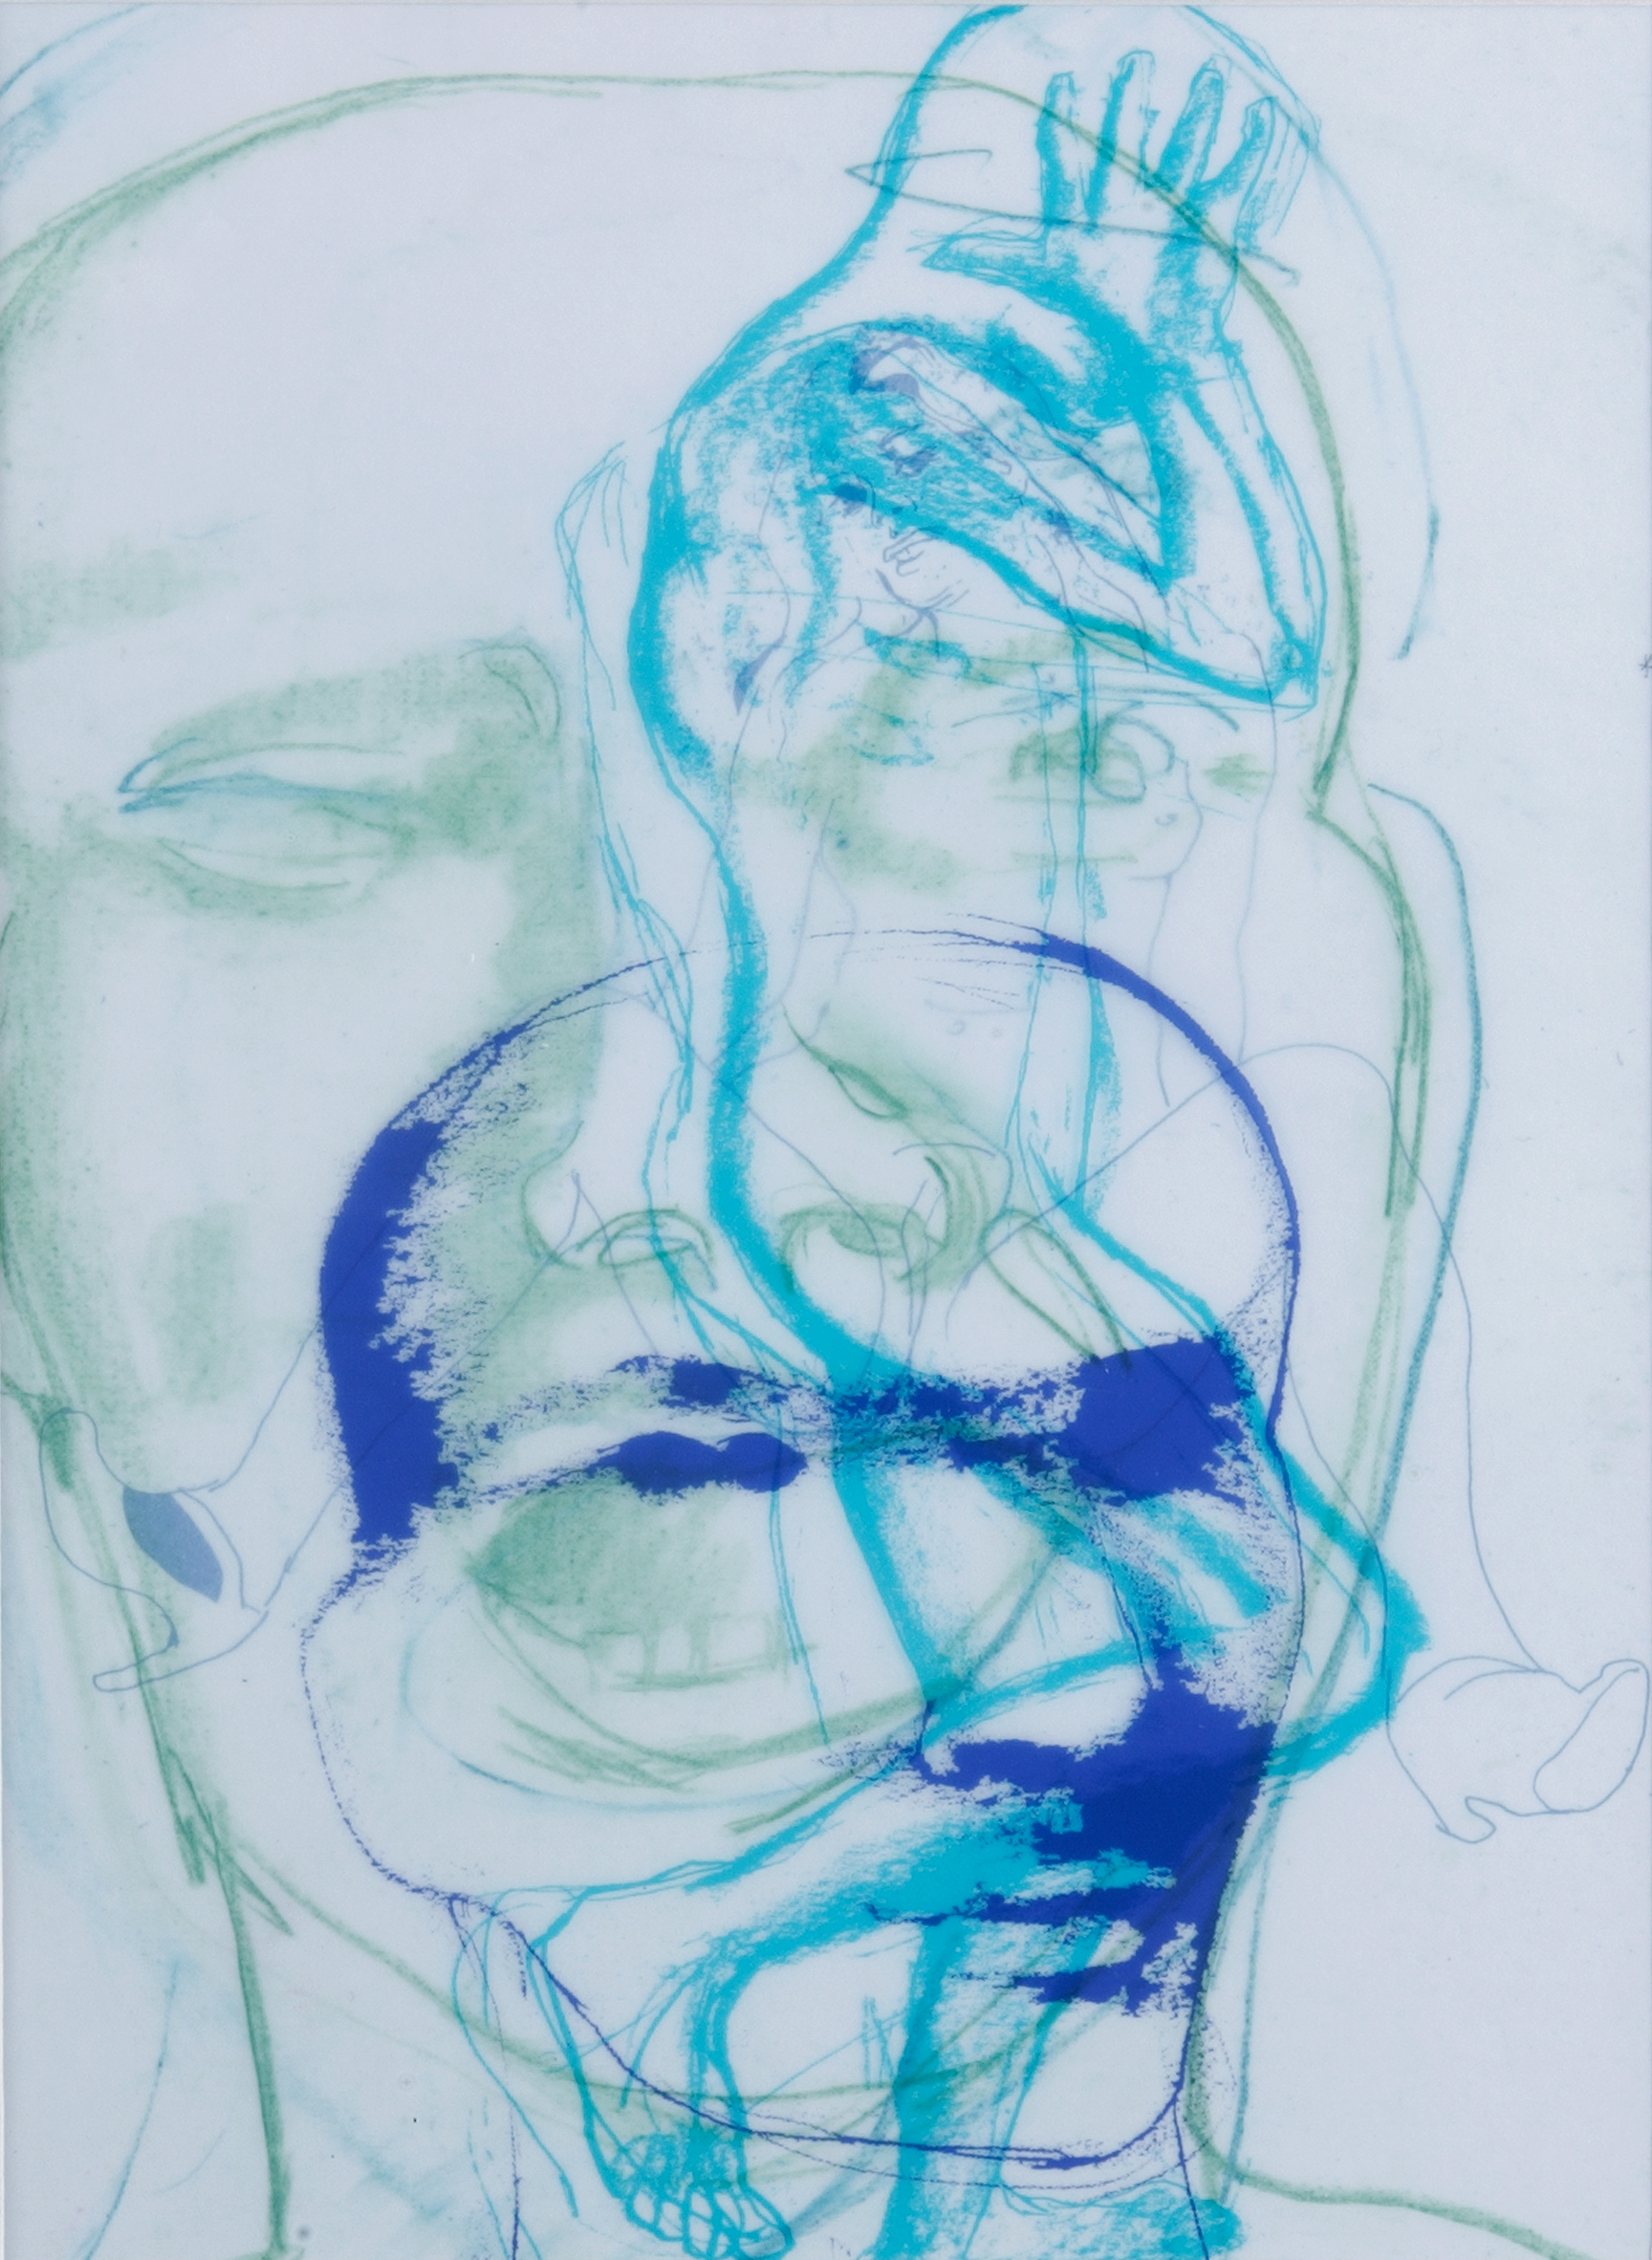 drawings and printings-mneme-penelope-kouvara-9